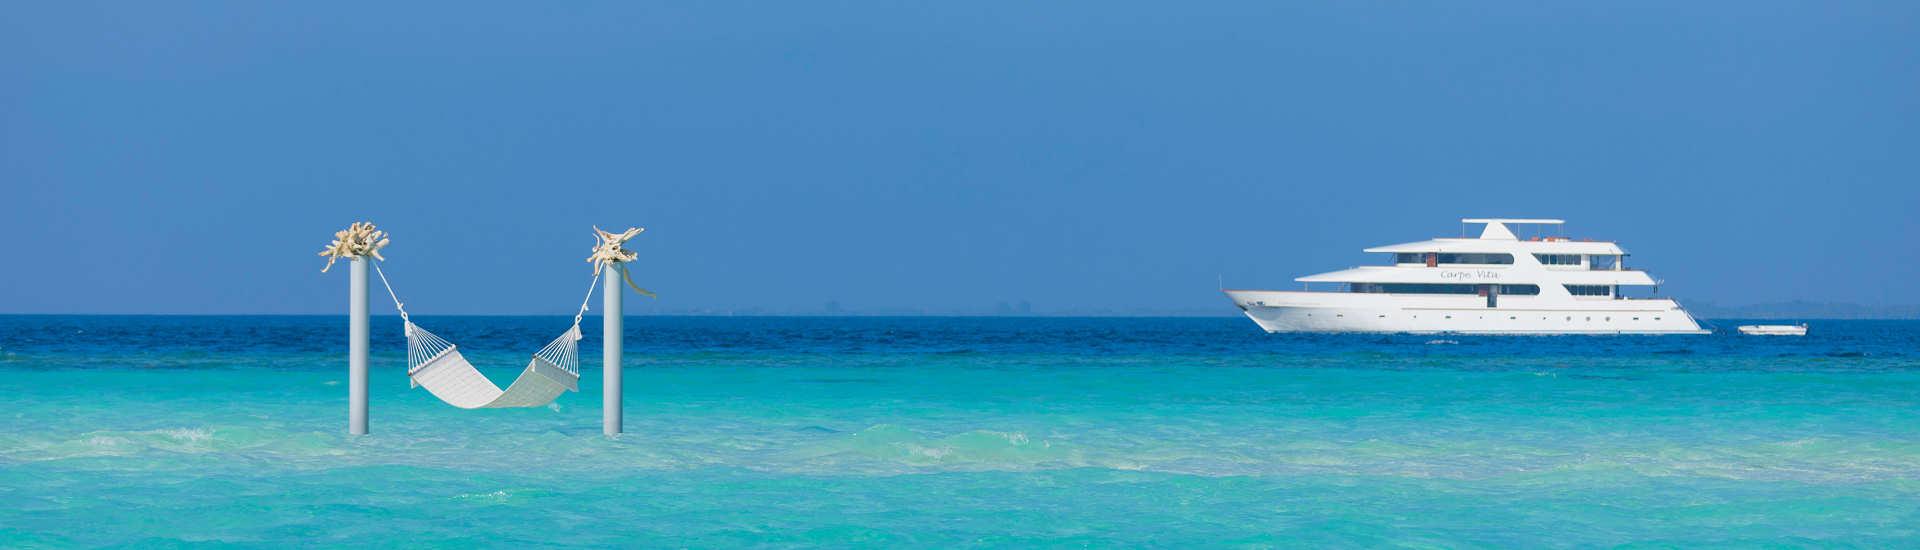 Safariboot Malediven